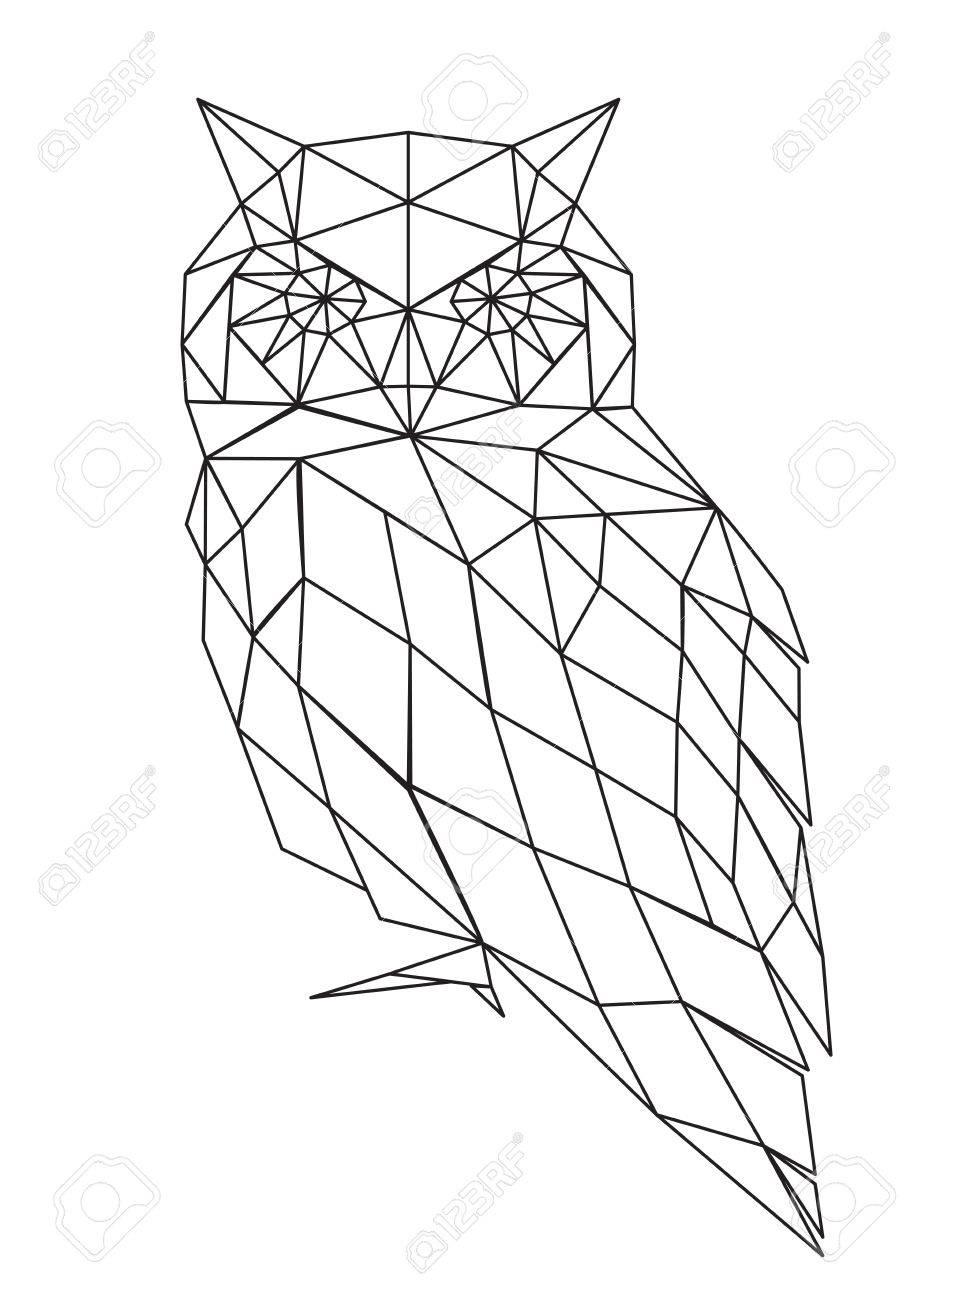 974x1300 54,846 Geometric Animal Stock Vector Illustration And Royalty Free